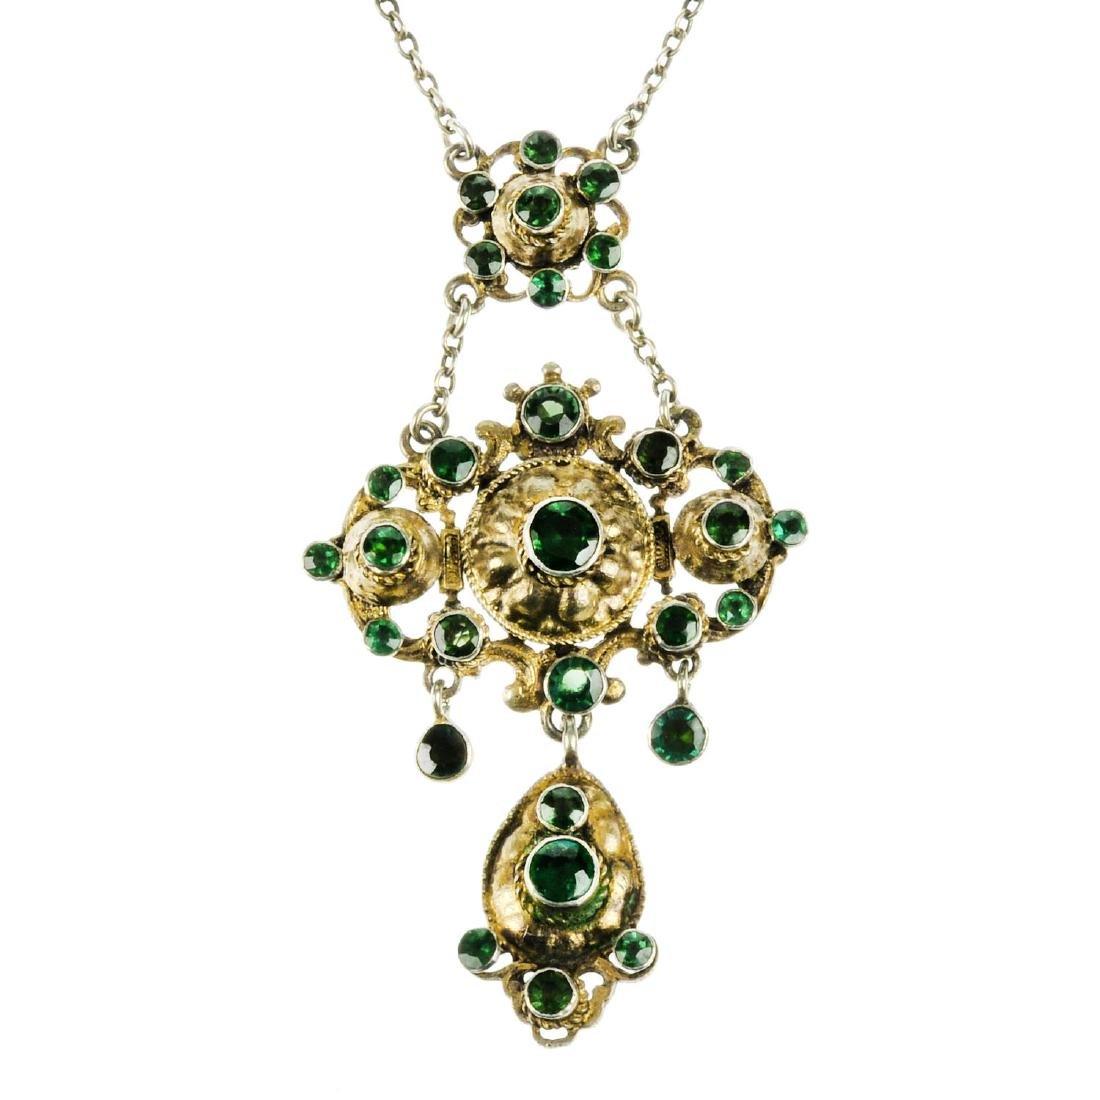 An Austro-Hungarian pendant necklace. The belcher-link